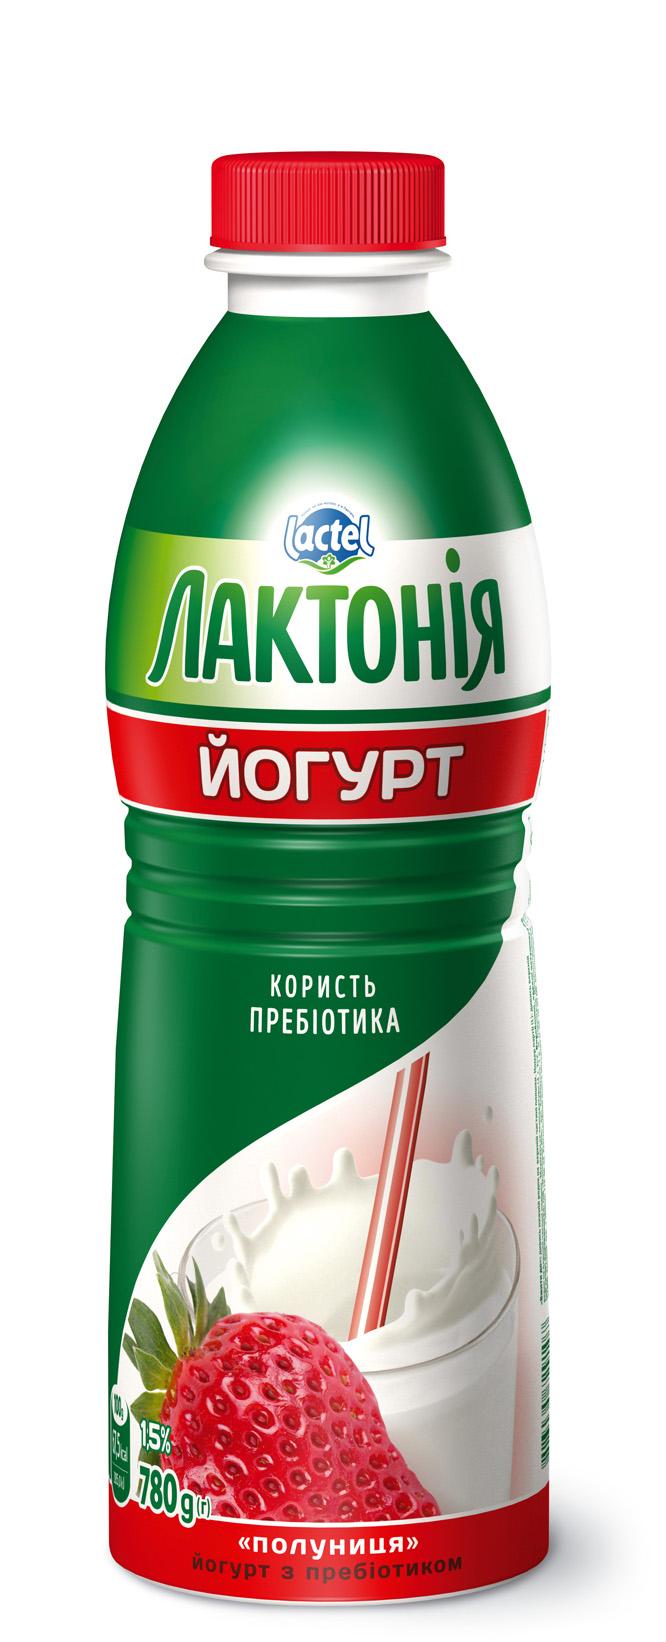 "Yogurt Strawberry with lactulose 1,5%,  ""Lactonia"" (Bottle 0,780)"